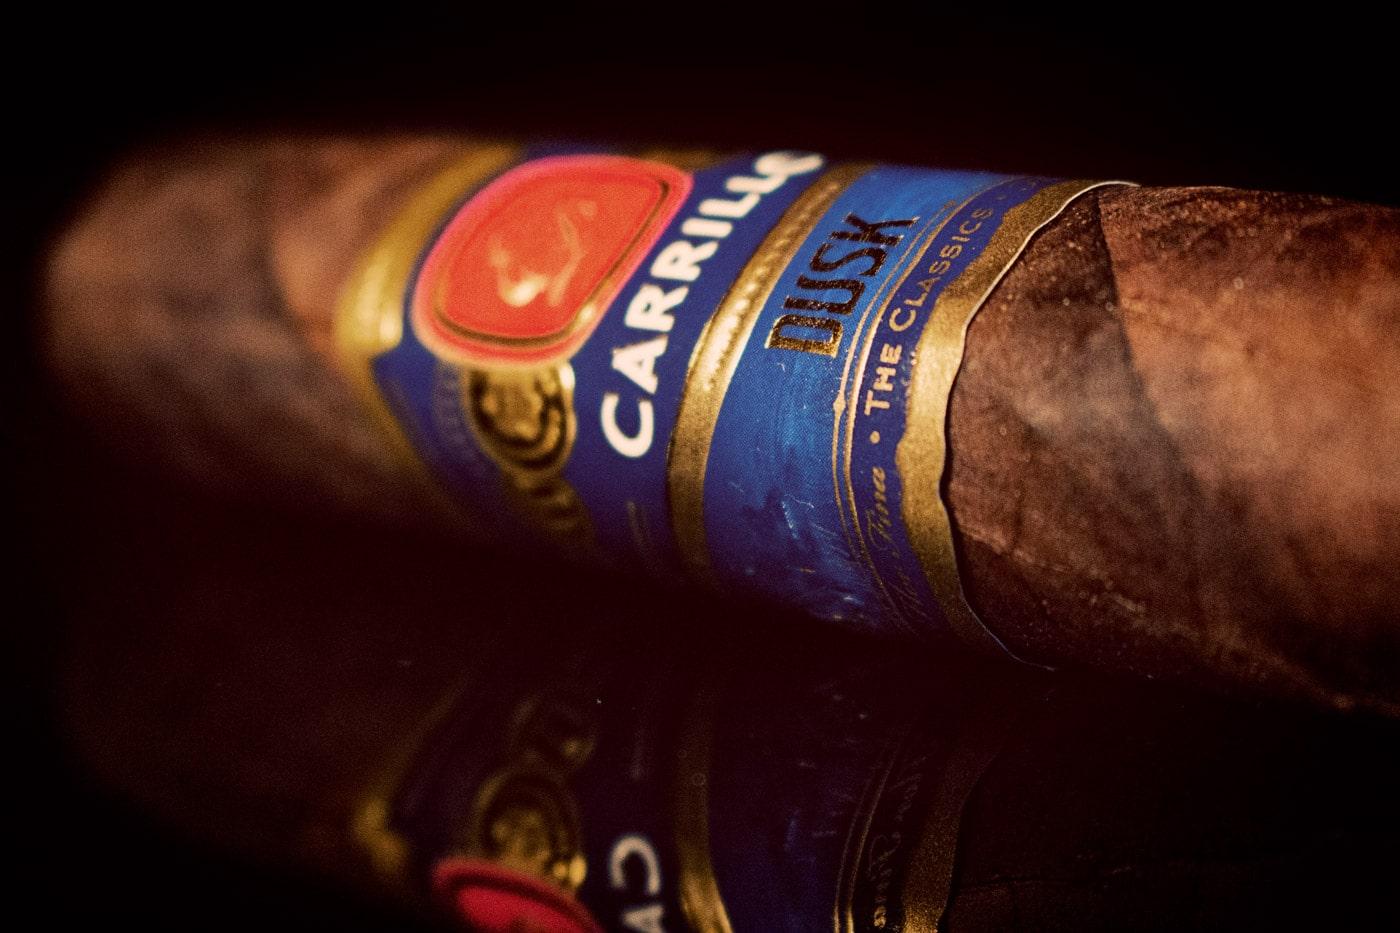 E.P. Carrillo Dusk Stout Toro cigar review